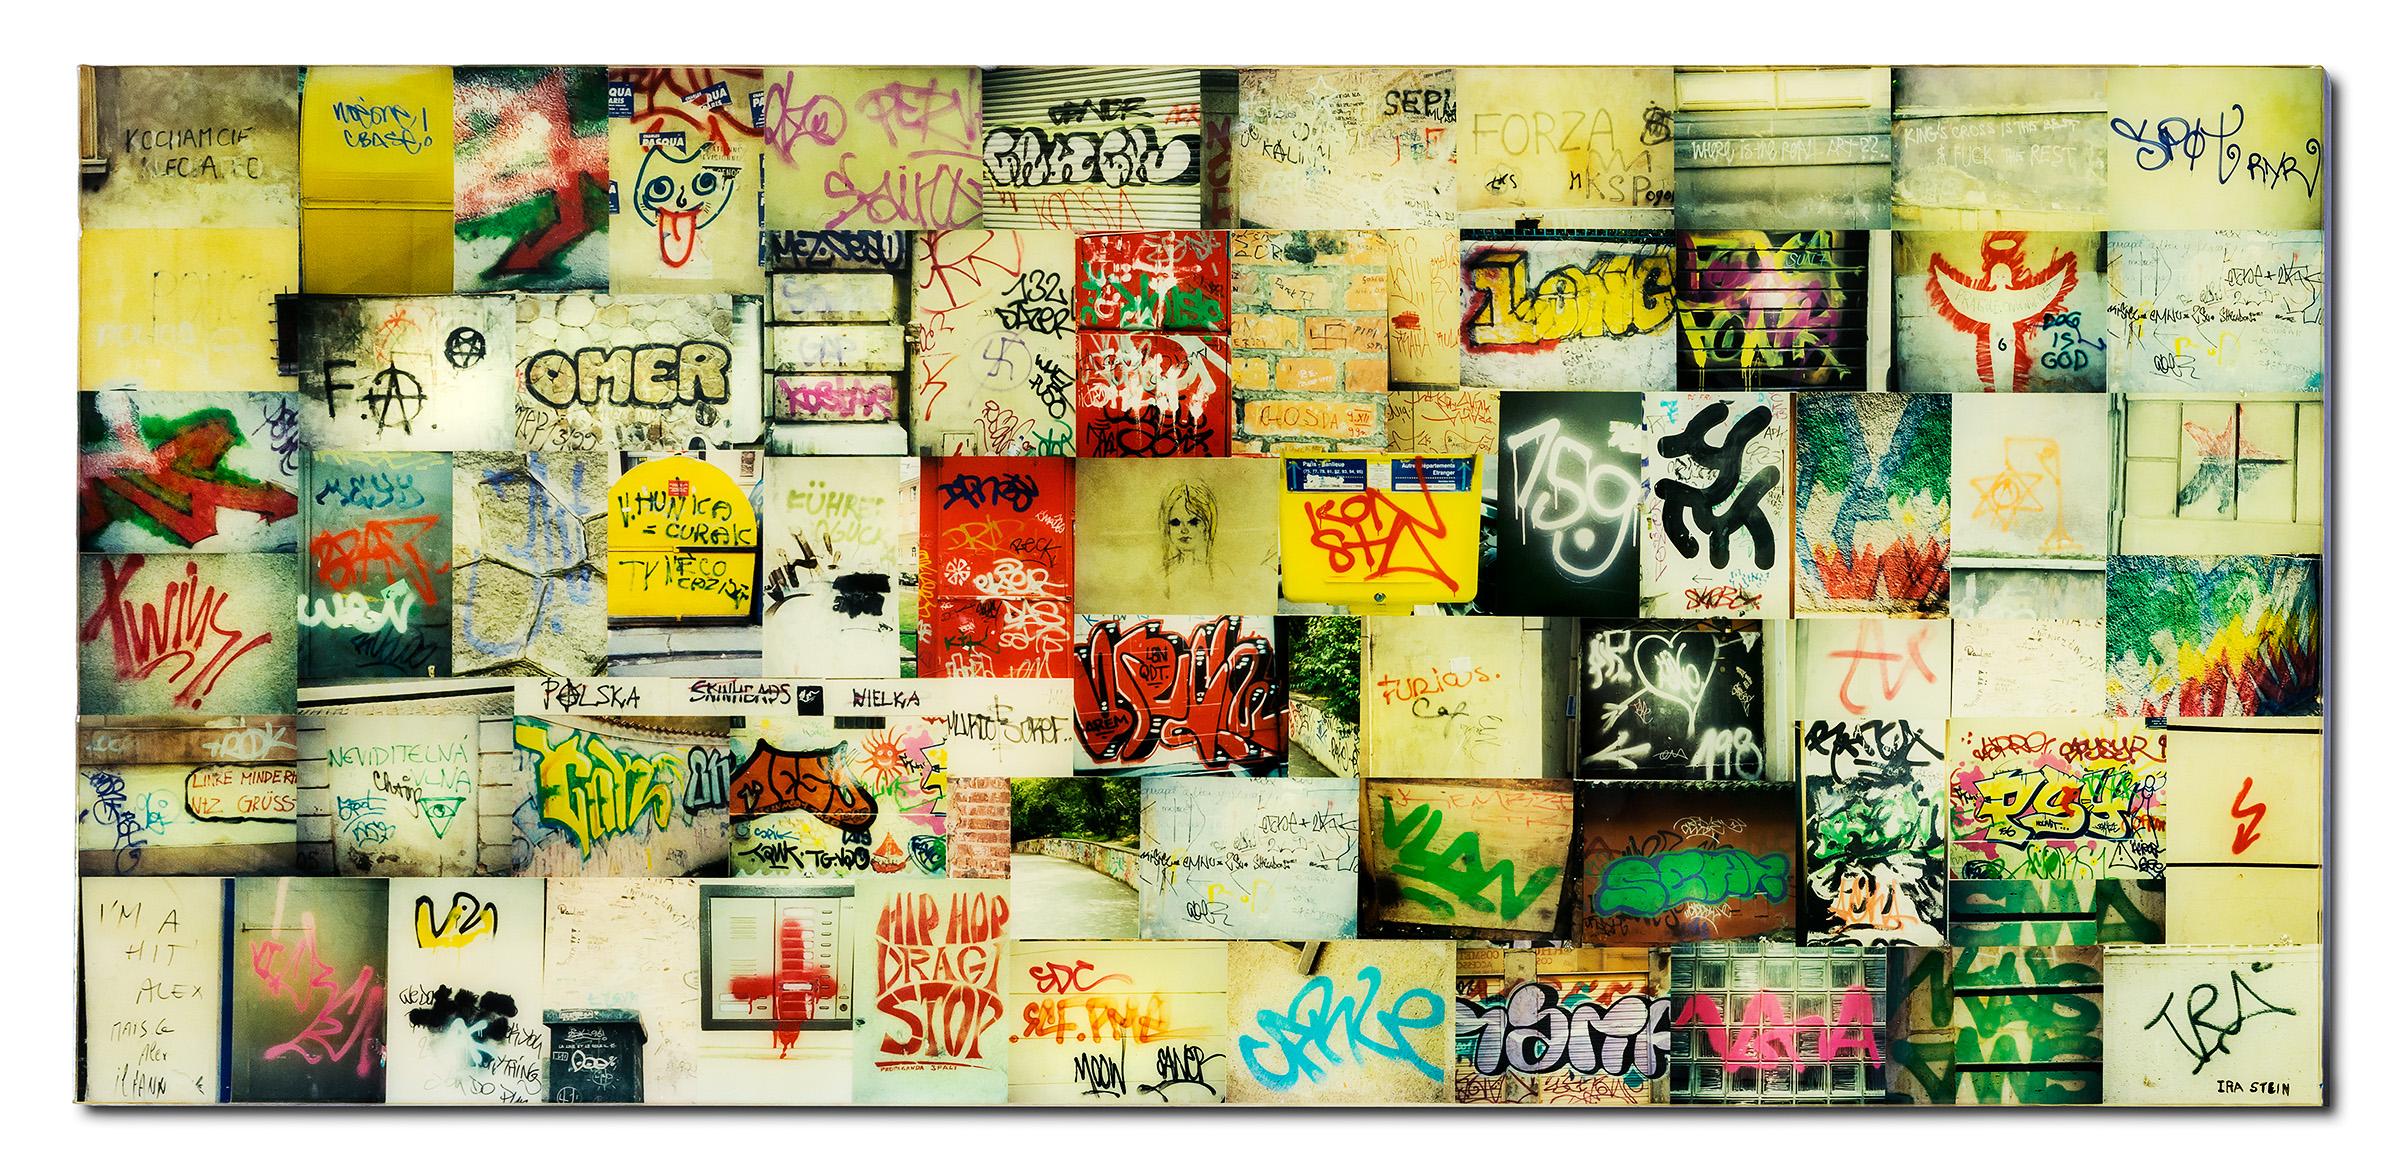 More Art | Ira Stein Contemporary Artist